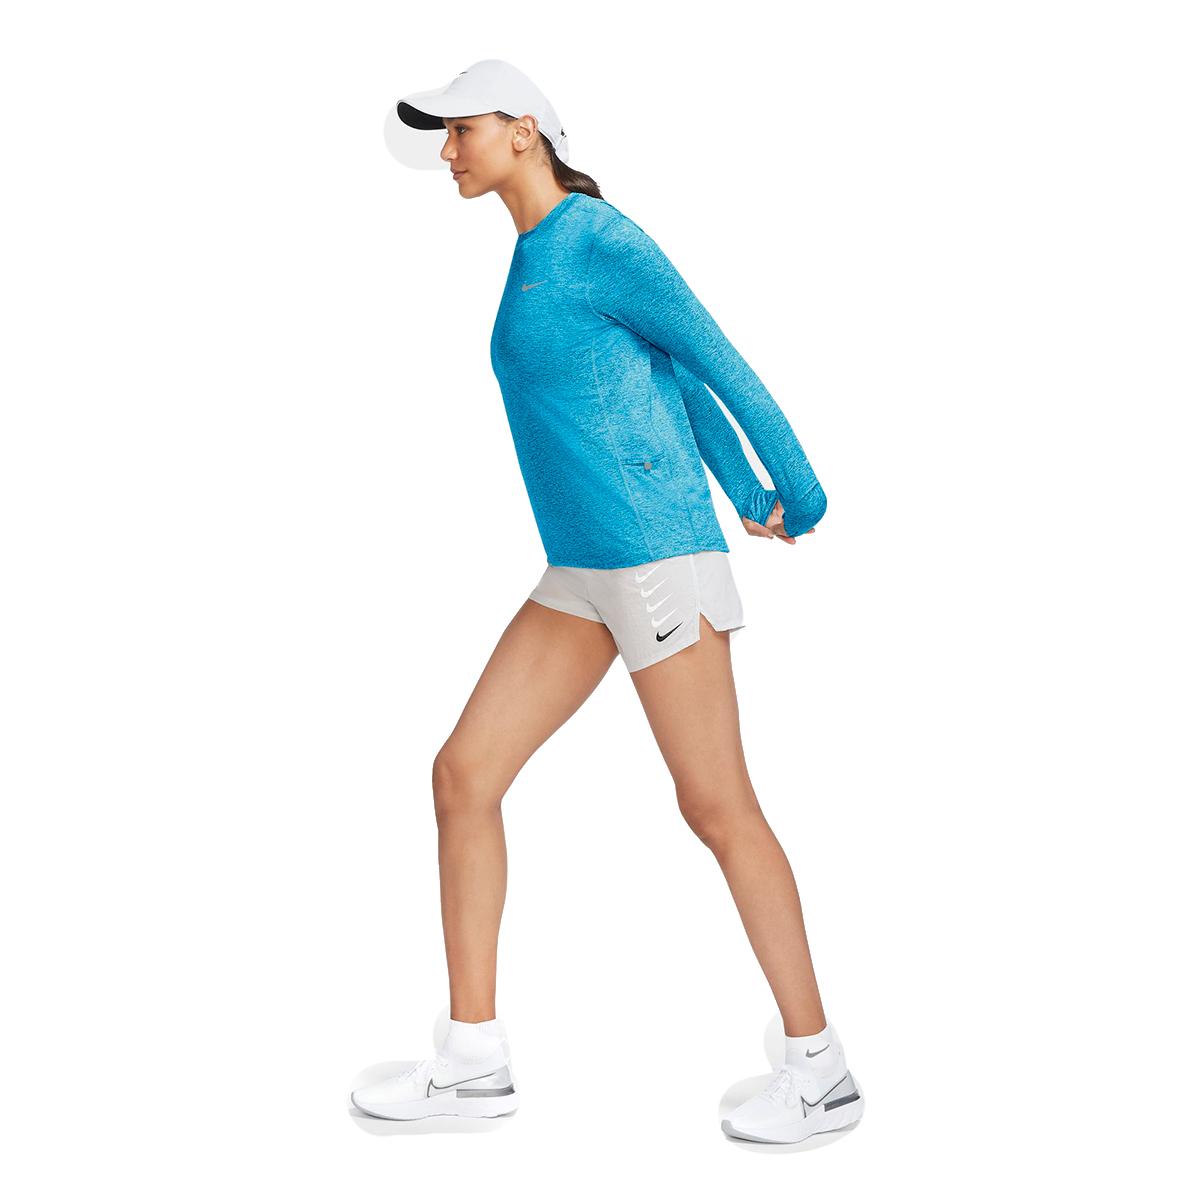 Women's Nike Element Crew Long Sleeve Shirt - Color: Lazer Blue/Glacier Ice - Size: XS, Lazer Blue/Glacier Ice, large, image 3